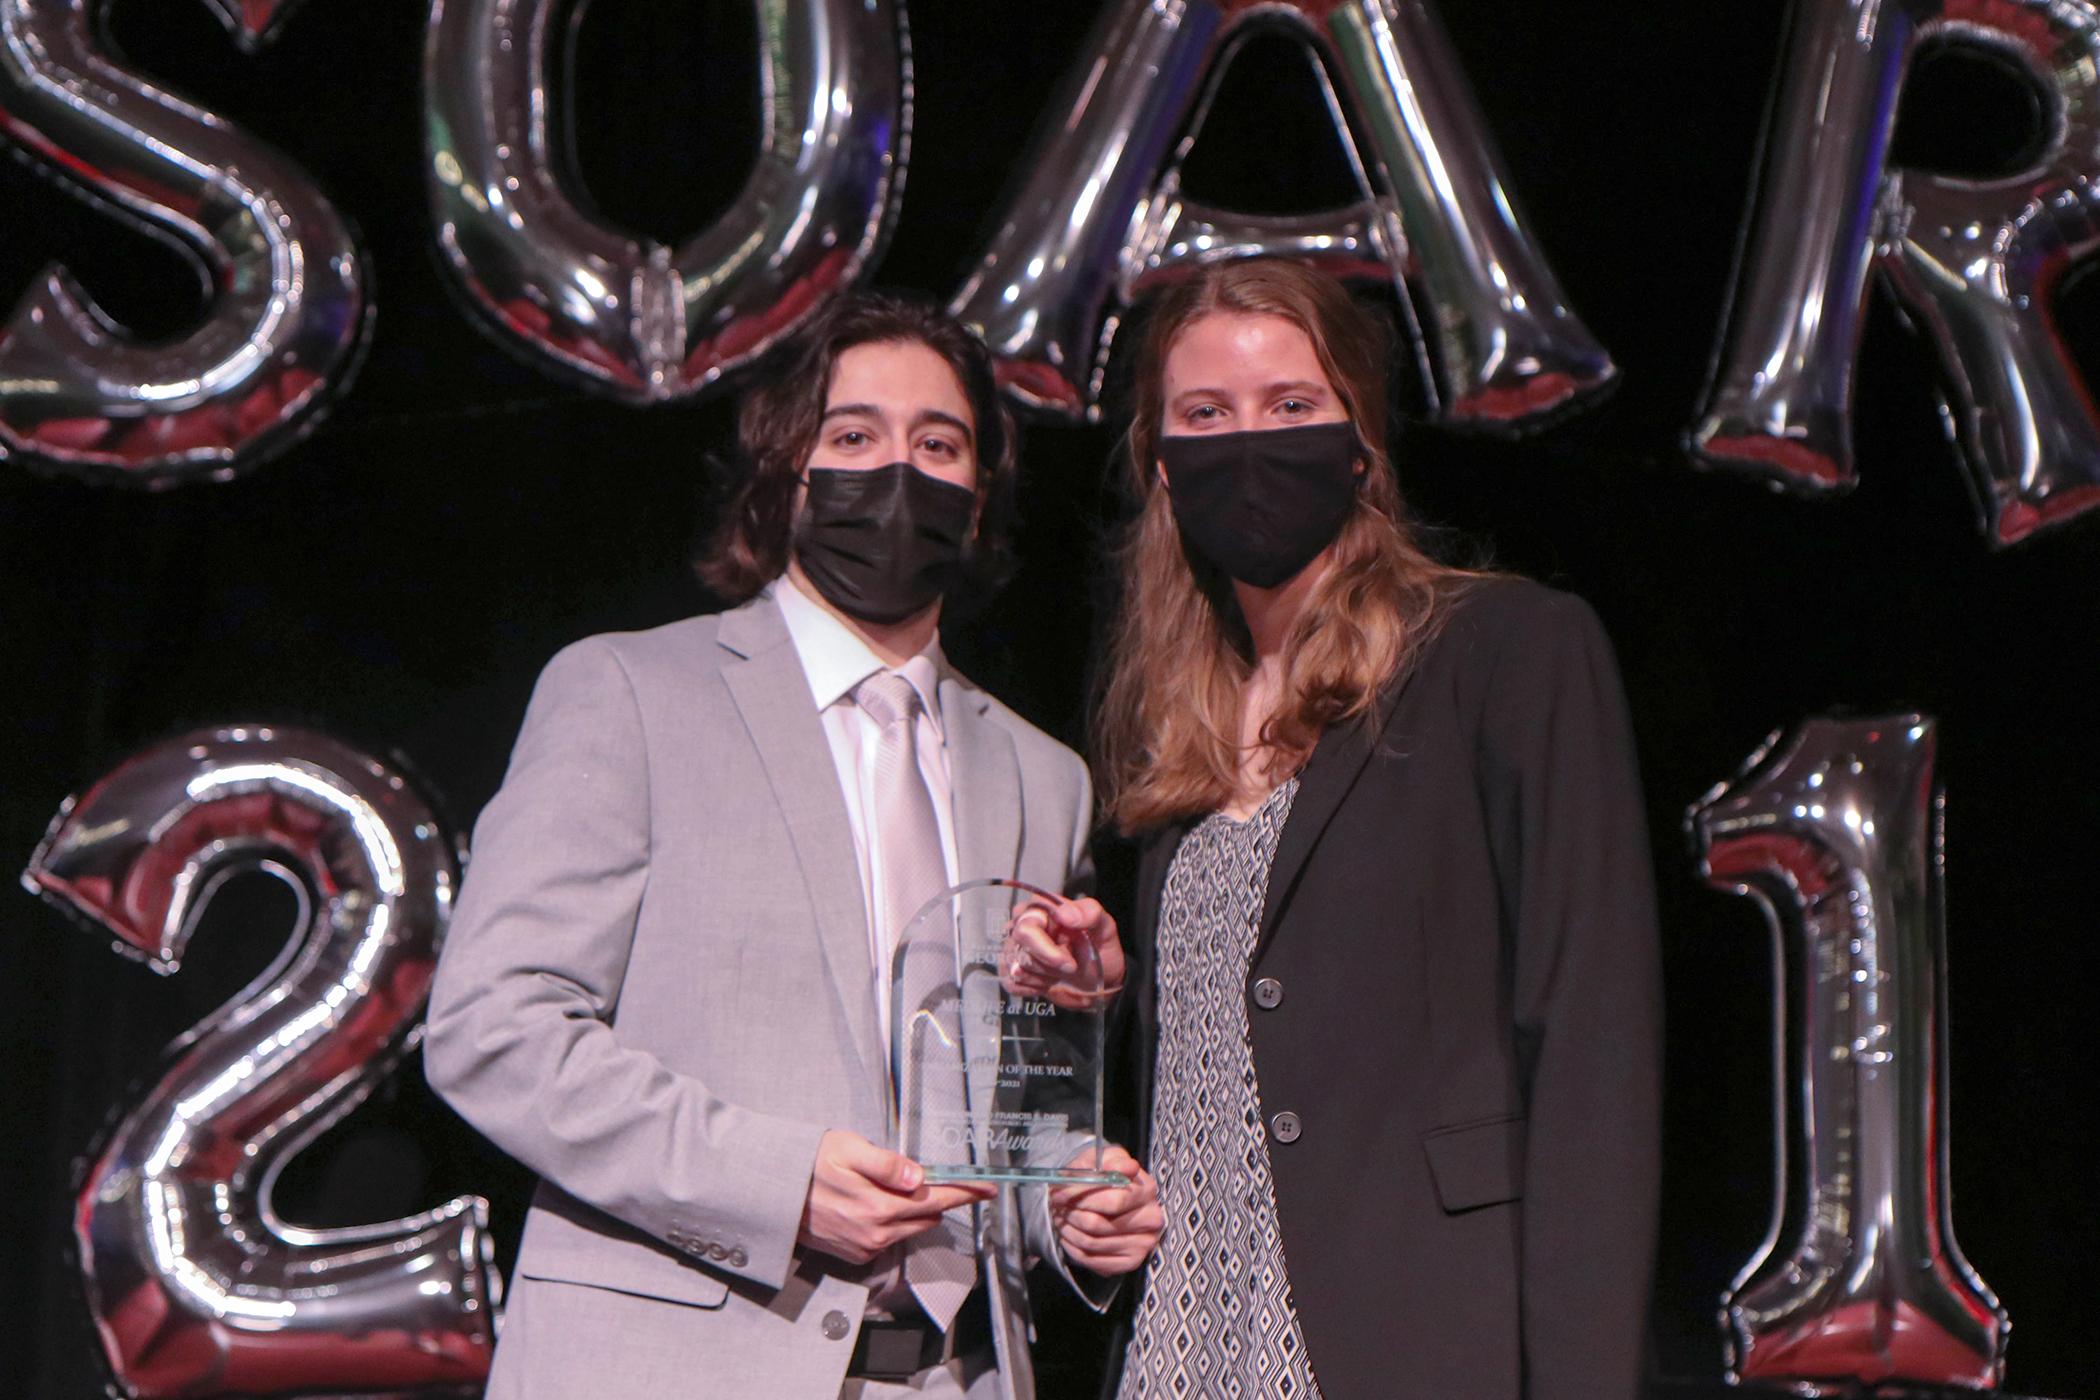 news.uga.edu: MEDLIFE at UGA receives top student organization award